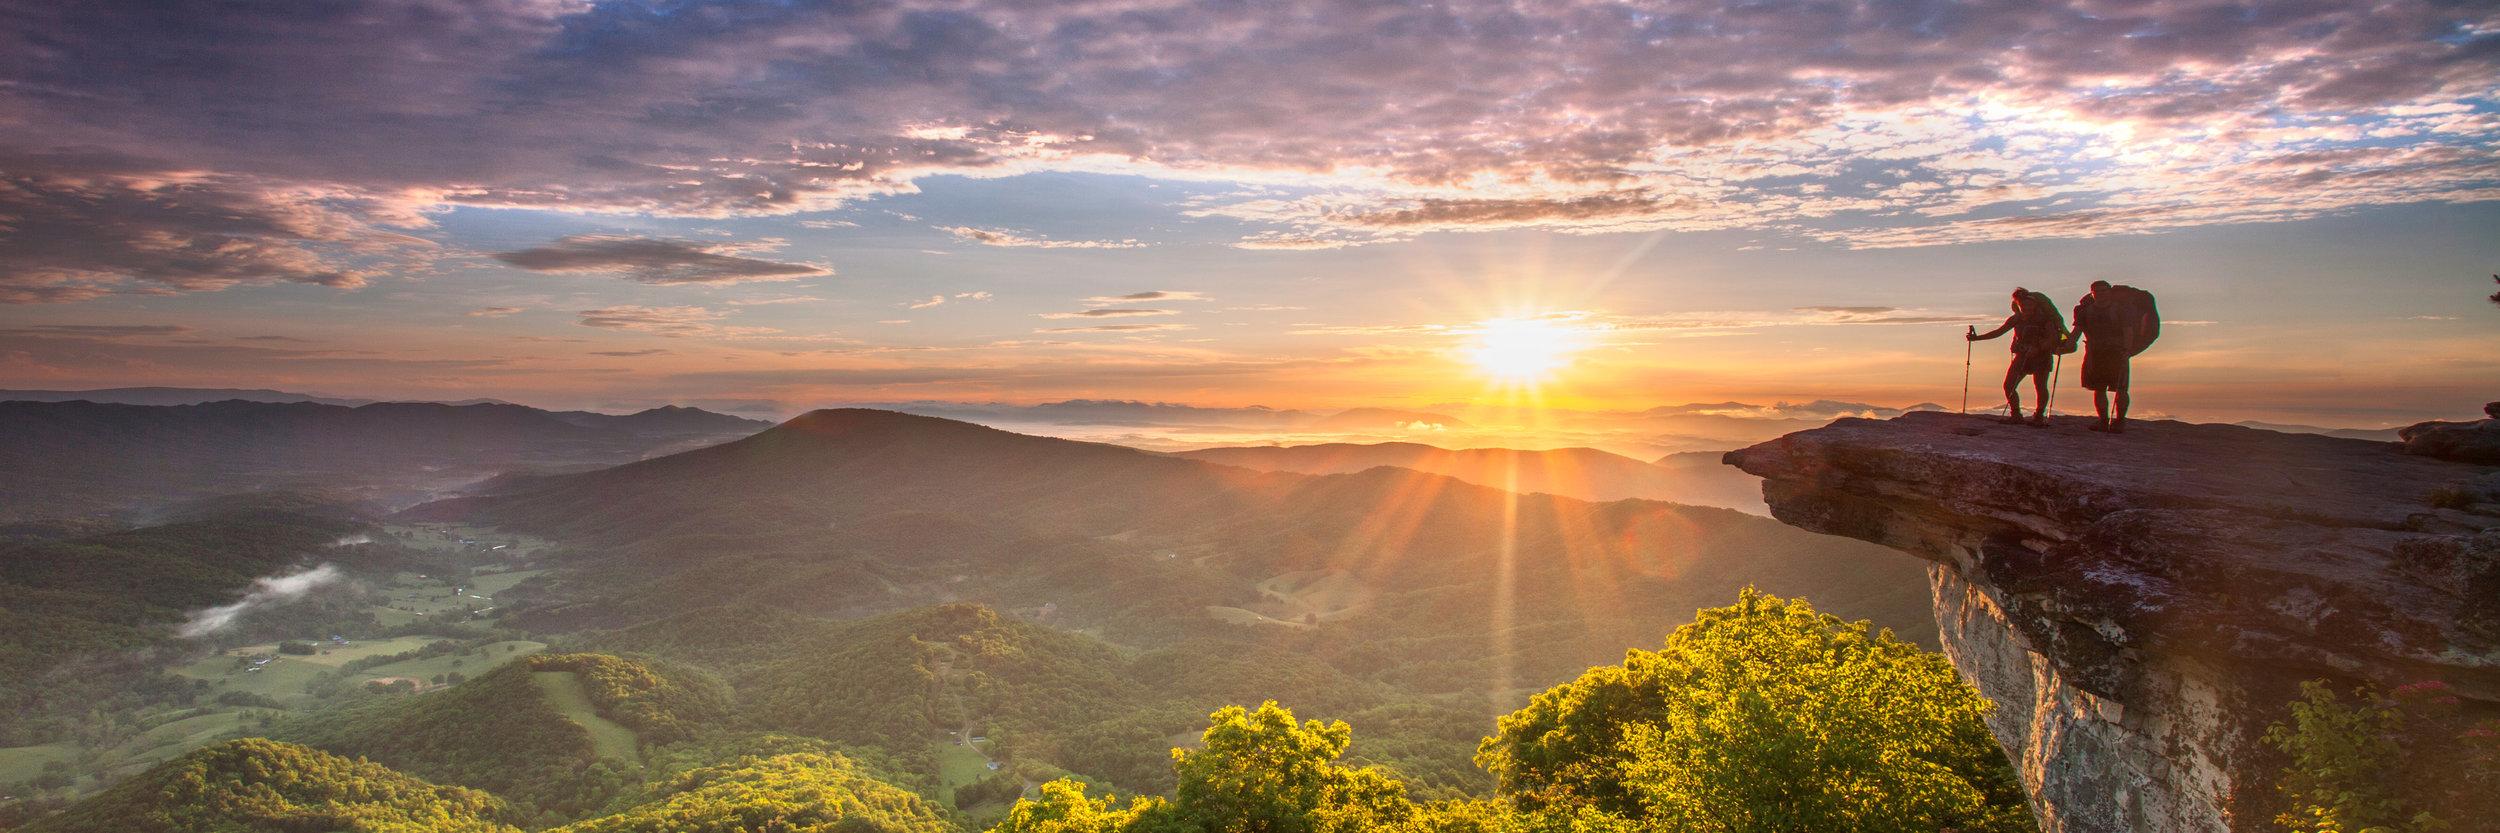 Photo Credits:  Brent McGuirt Photography - Visit Virginia's Blue Ridge